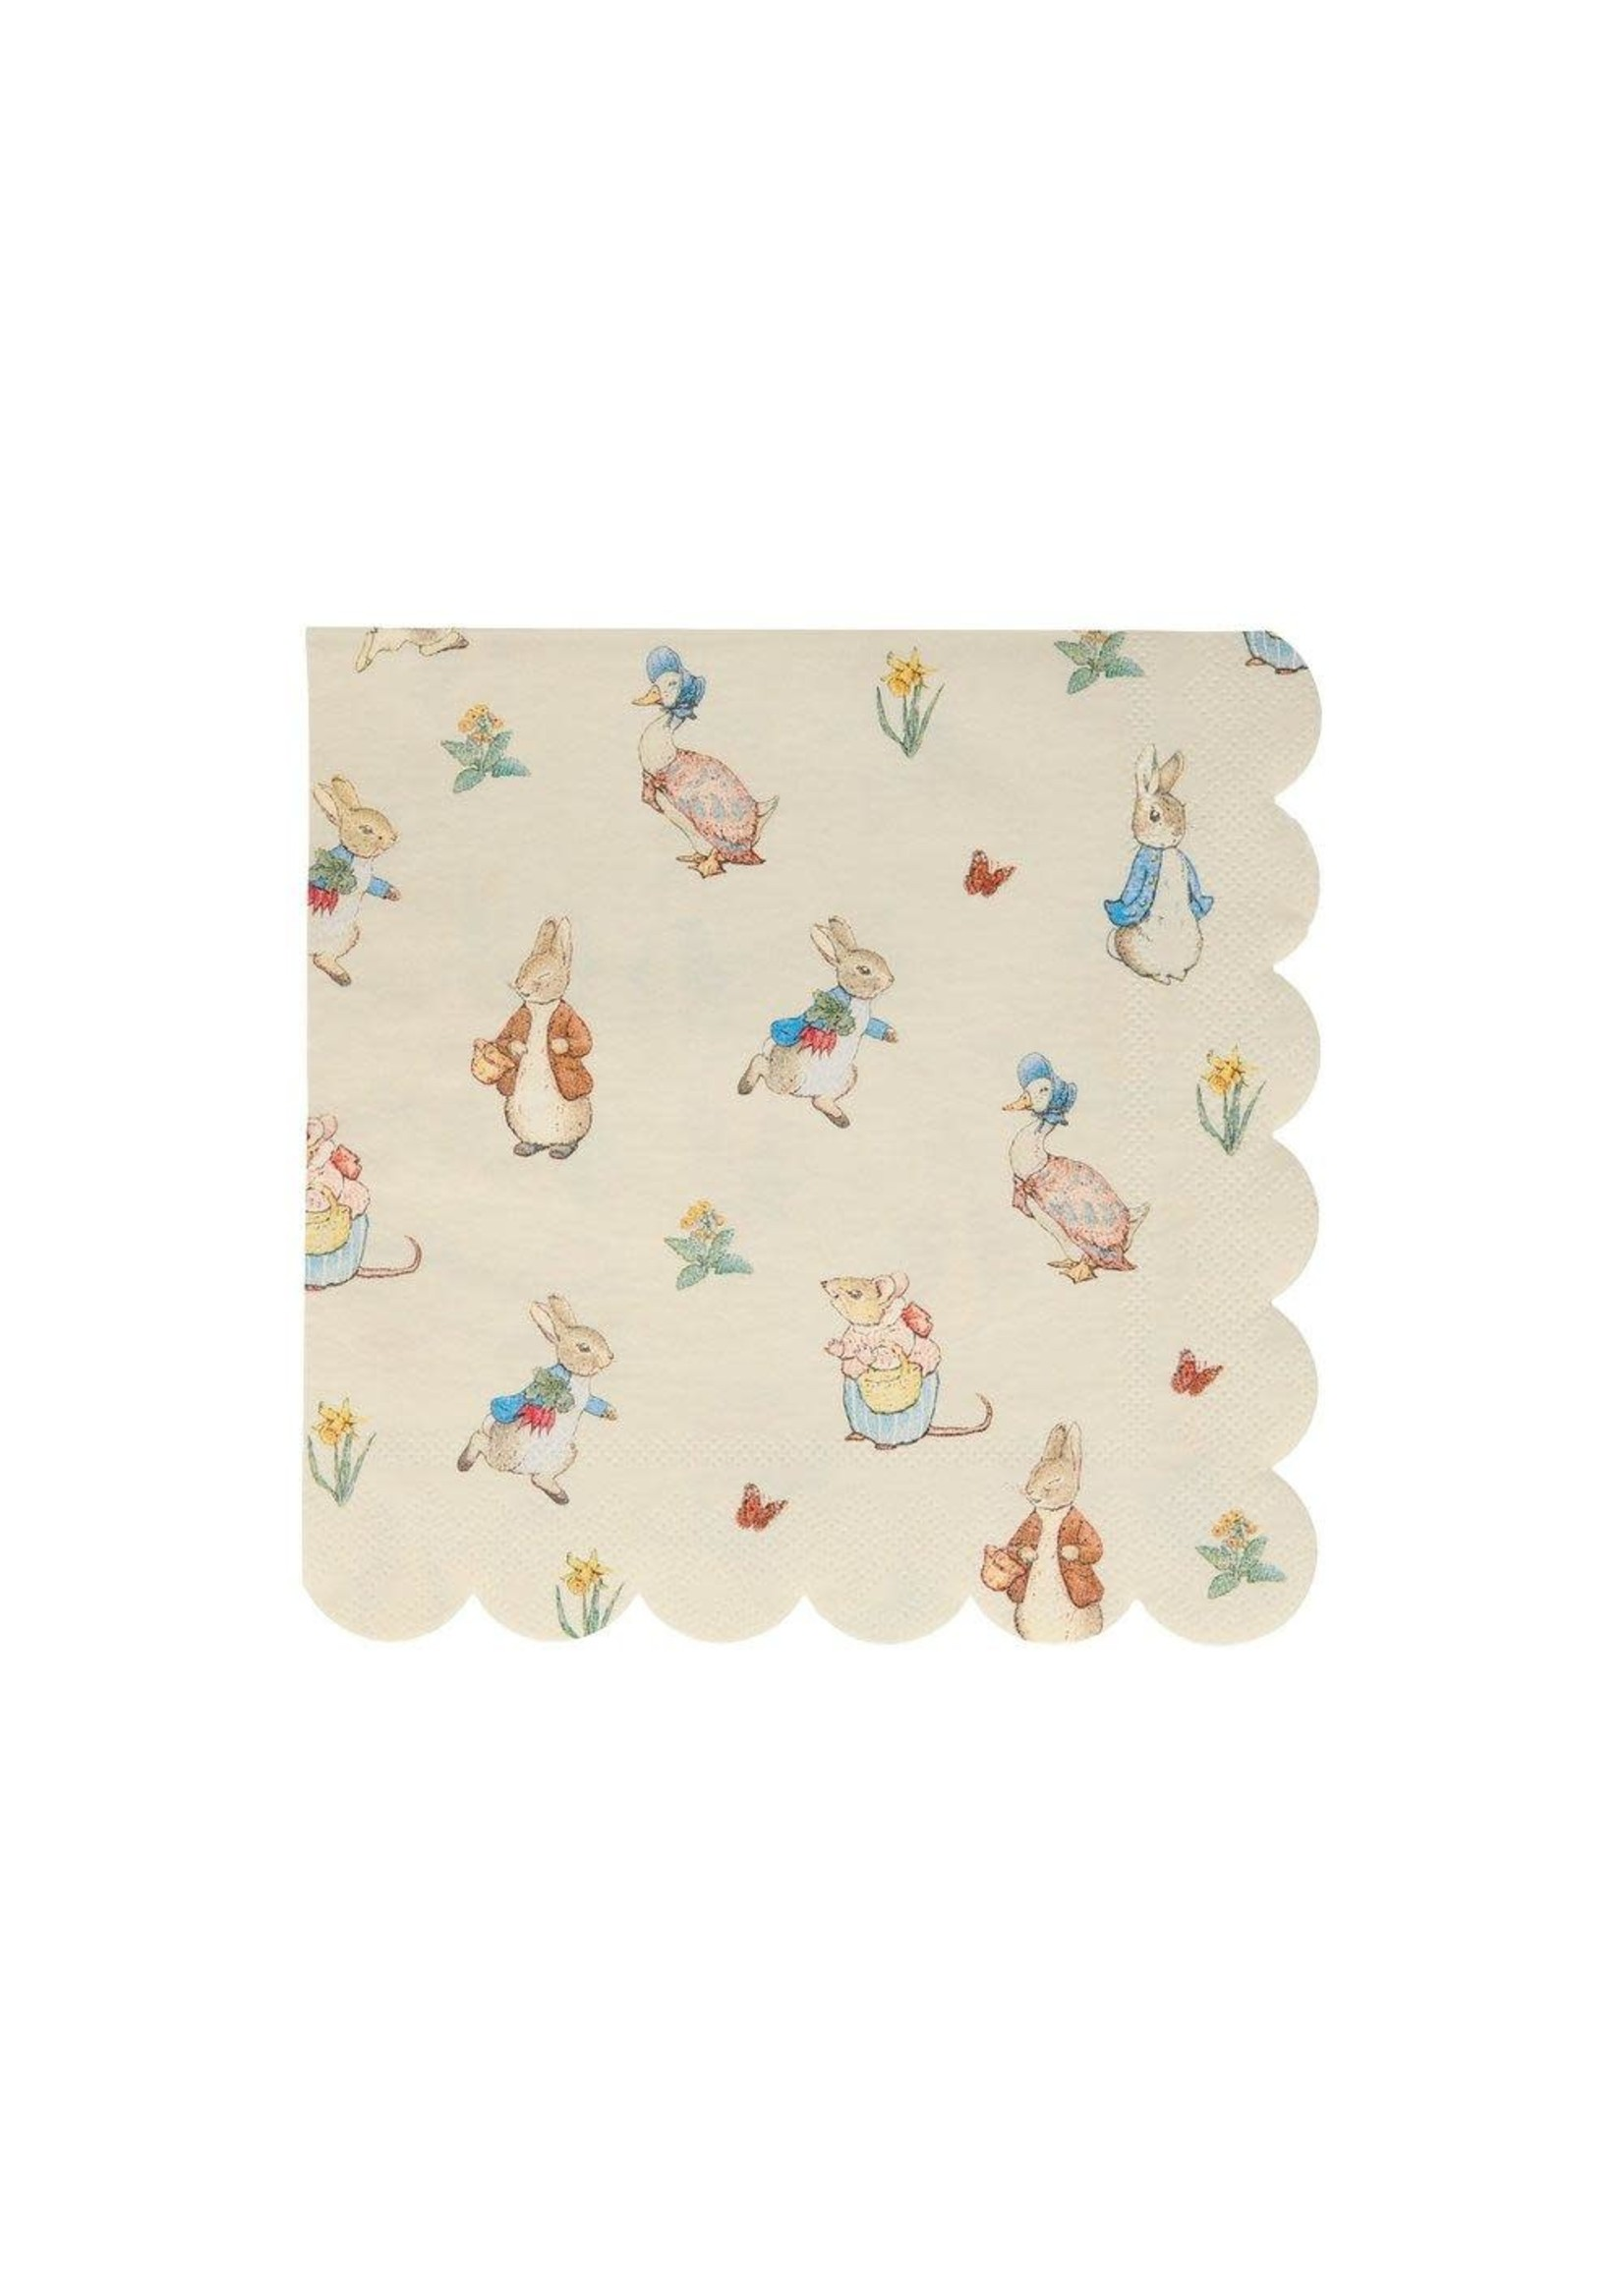 Meri Meri Paper Napkin - Peter Rabbit & Friends Large